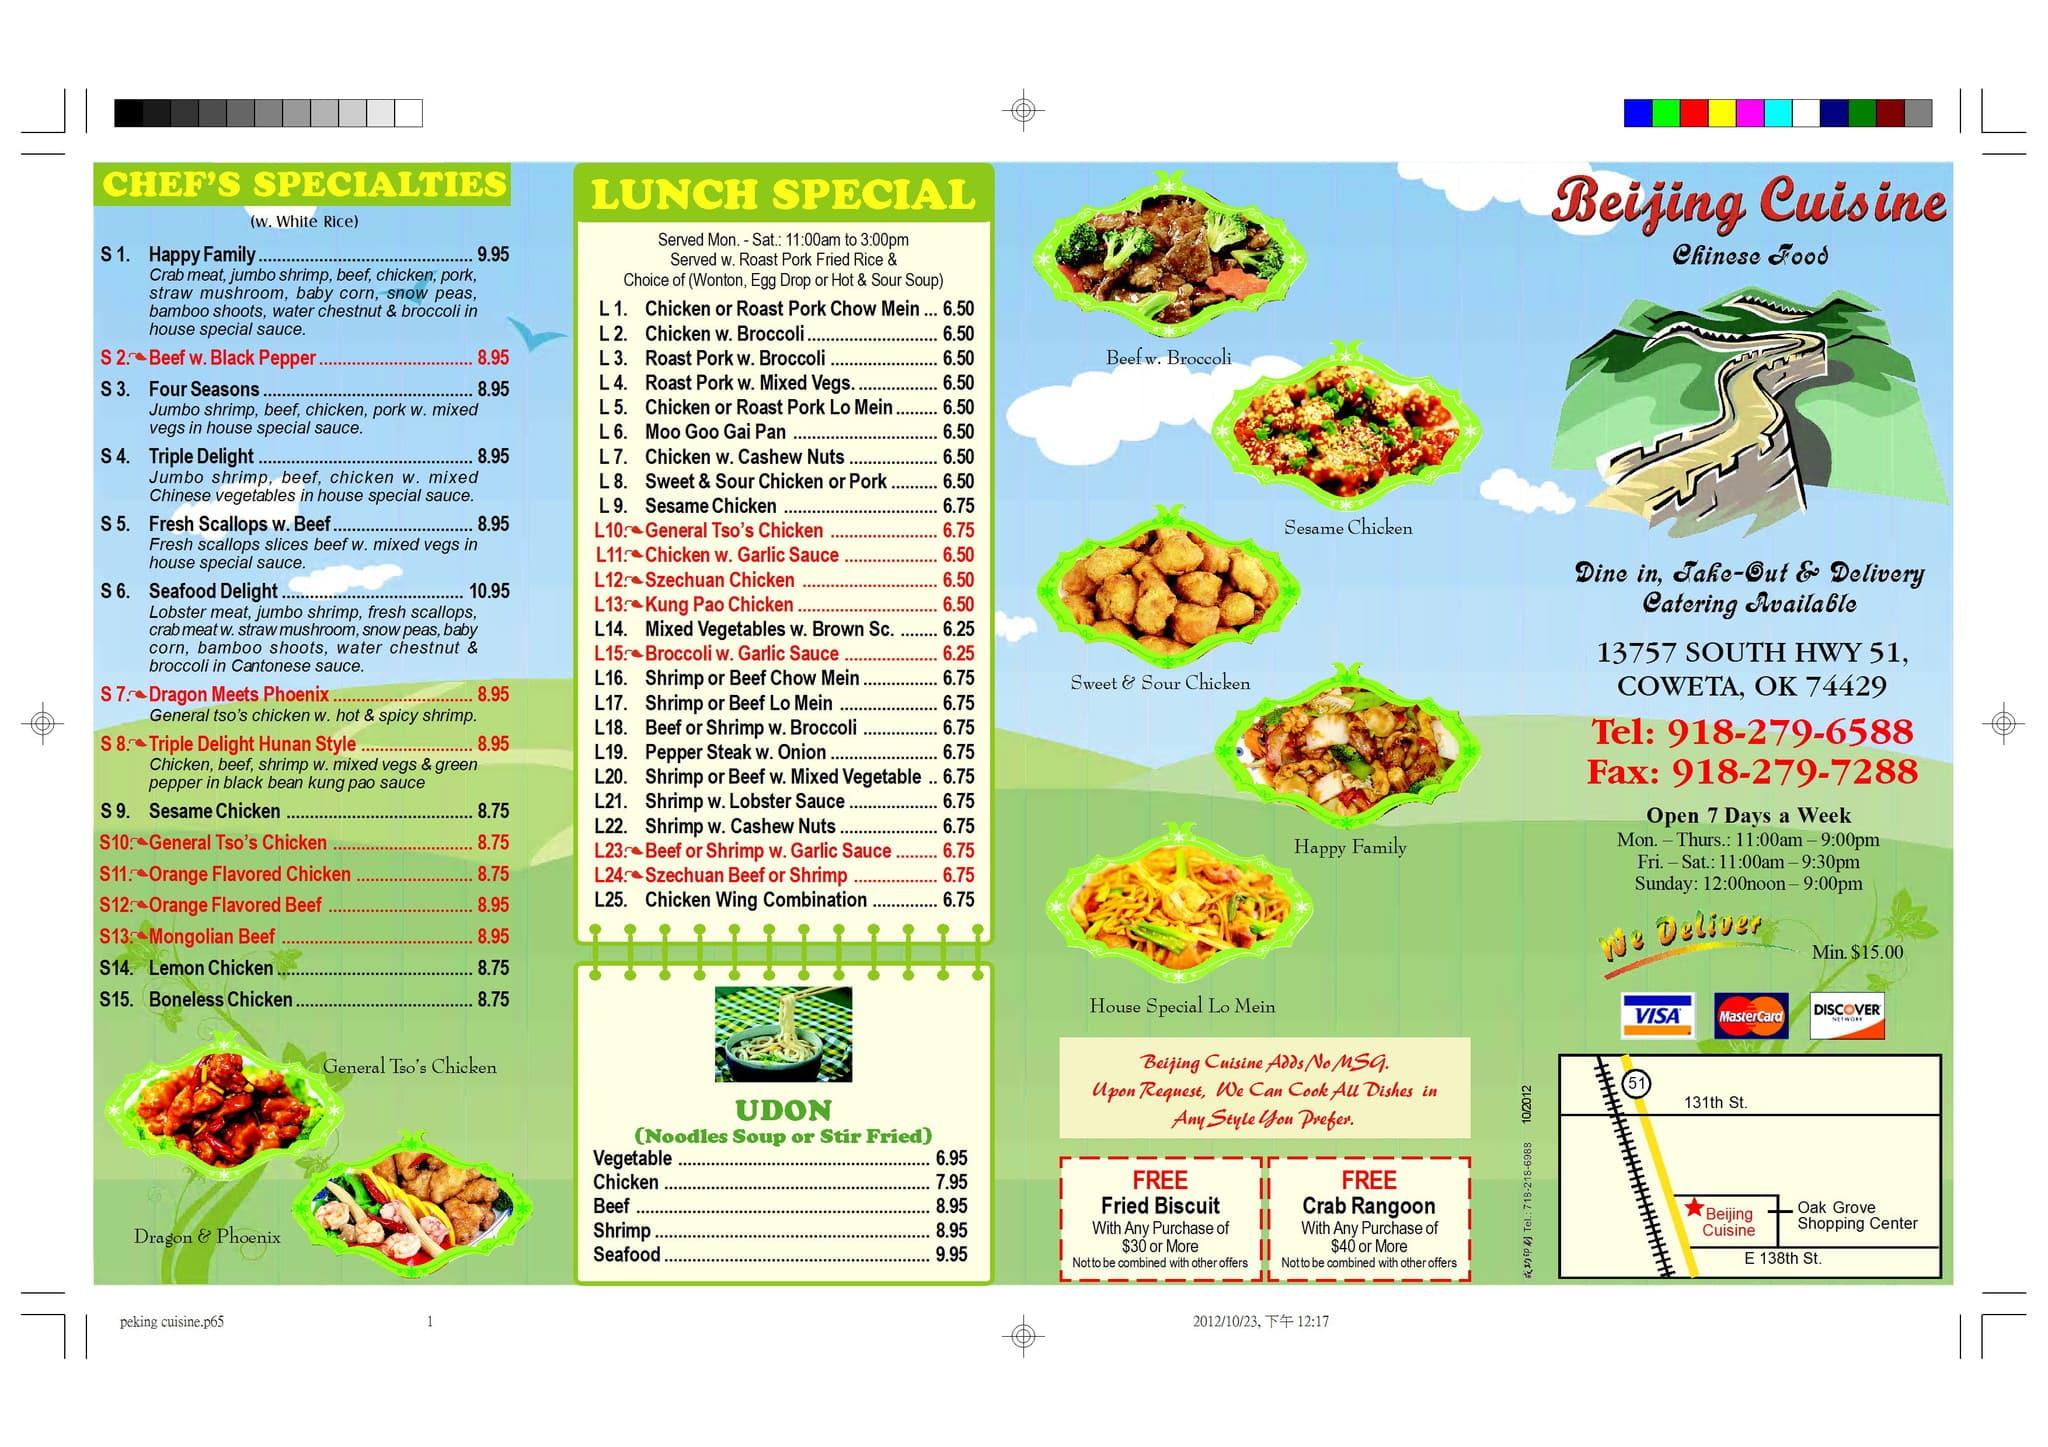 Beijing cuisine menu menu for beijing cuisine coweta for Asian cuisine tulsa menu